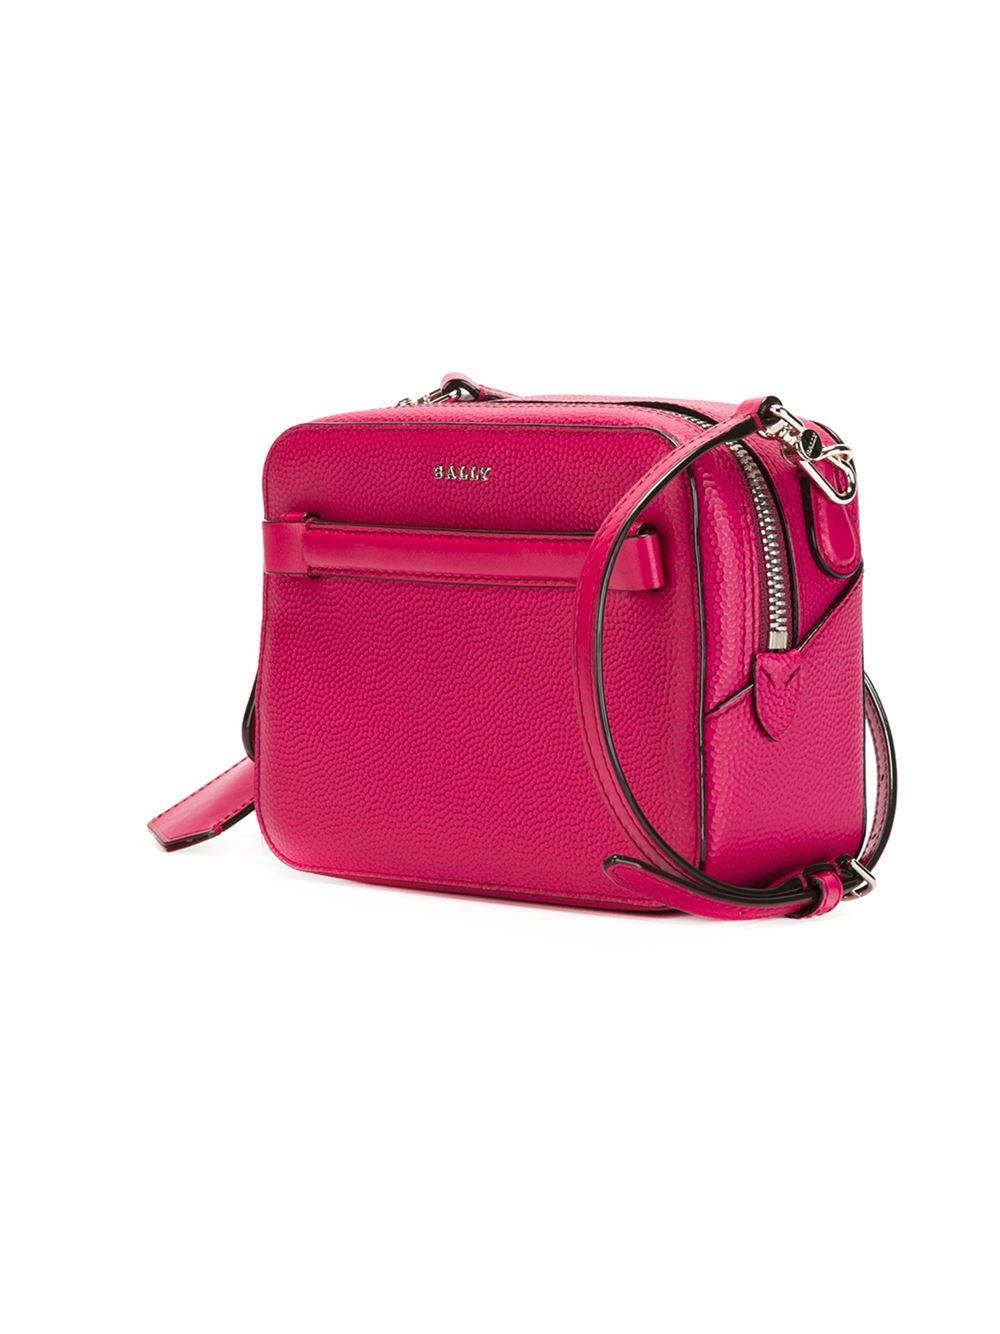 New Bally Bags For Women  Bag Lady  Pinterest